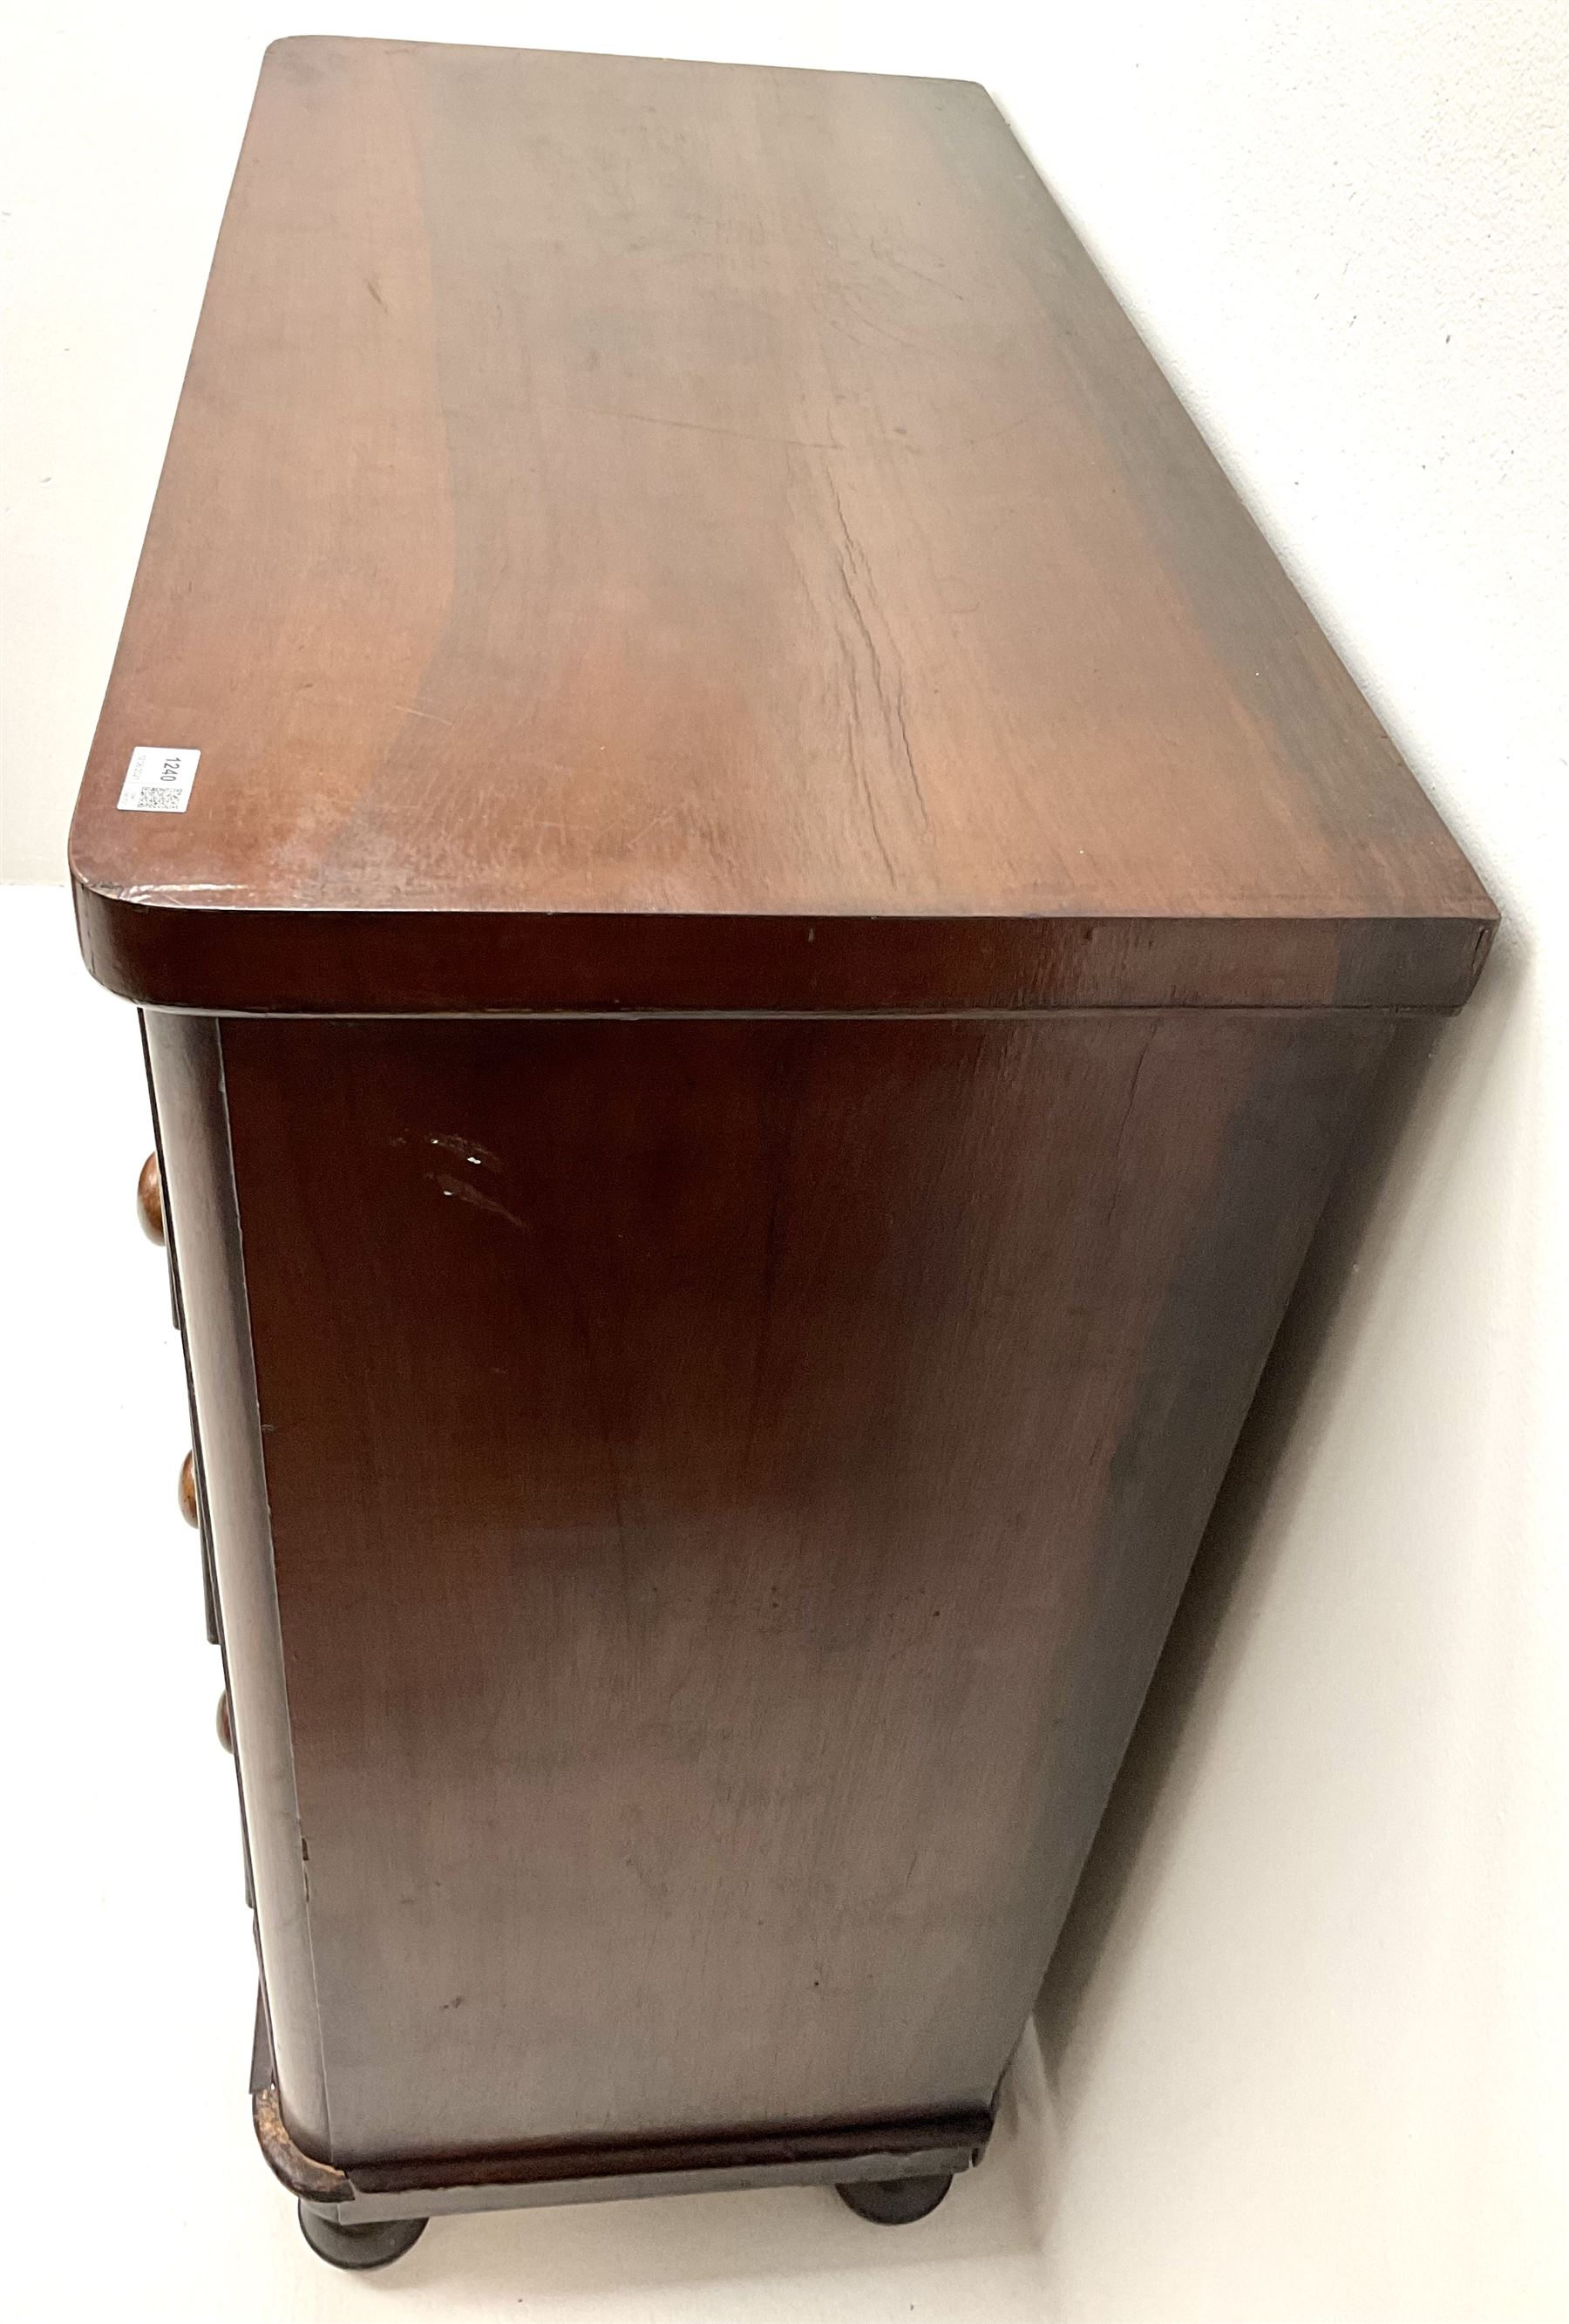 Victorian mahogany chest - Image 4 of 5